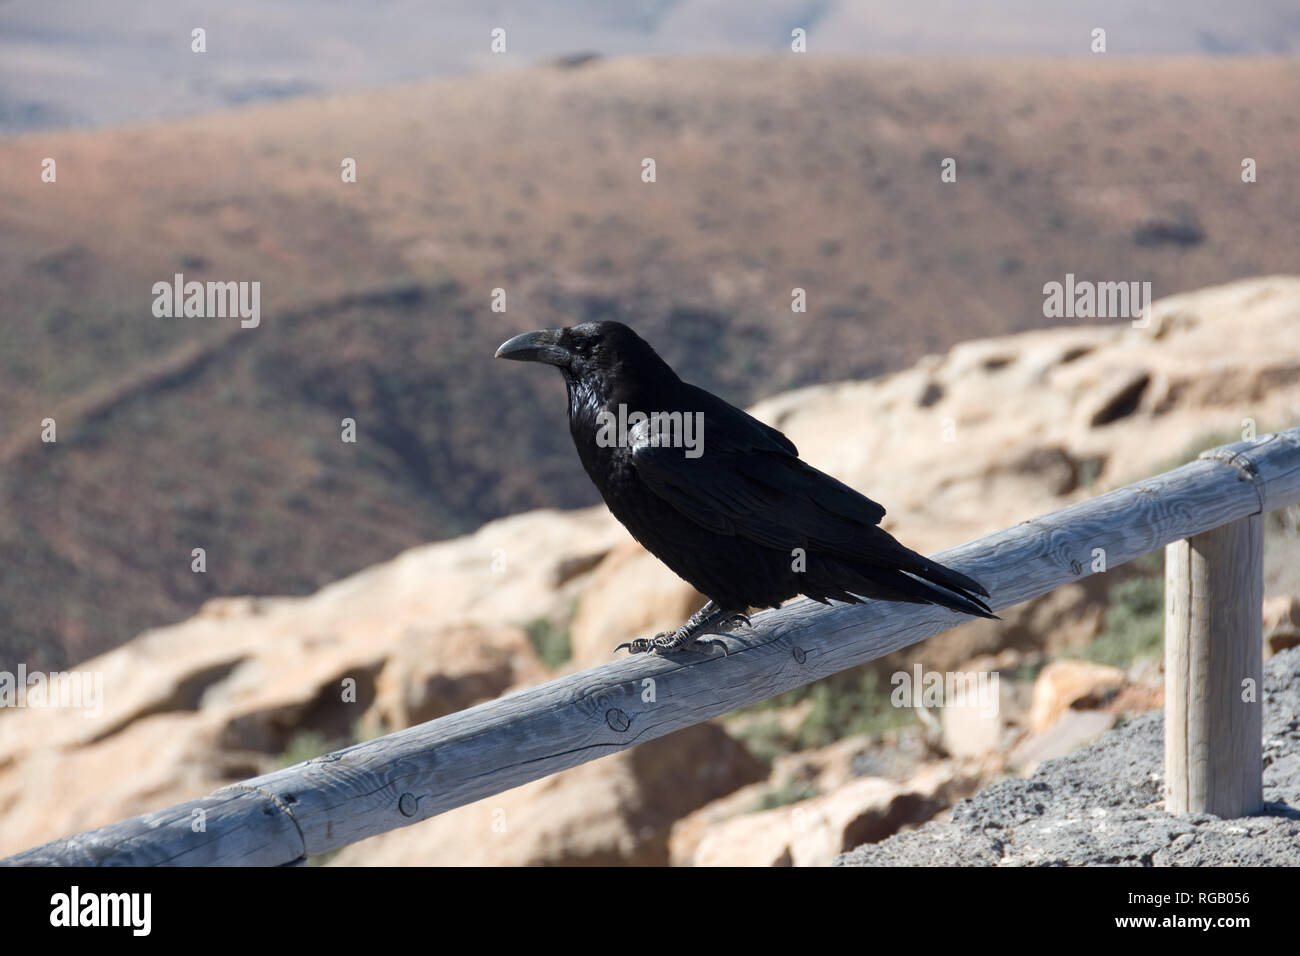 Kolkrabe Corvus Corax sitzen auf einem Zaun in Spanien Stockbild